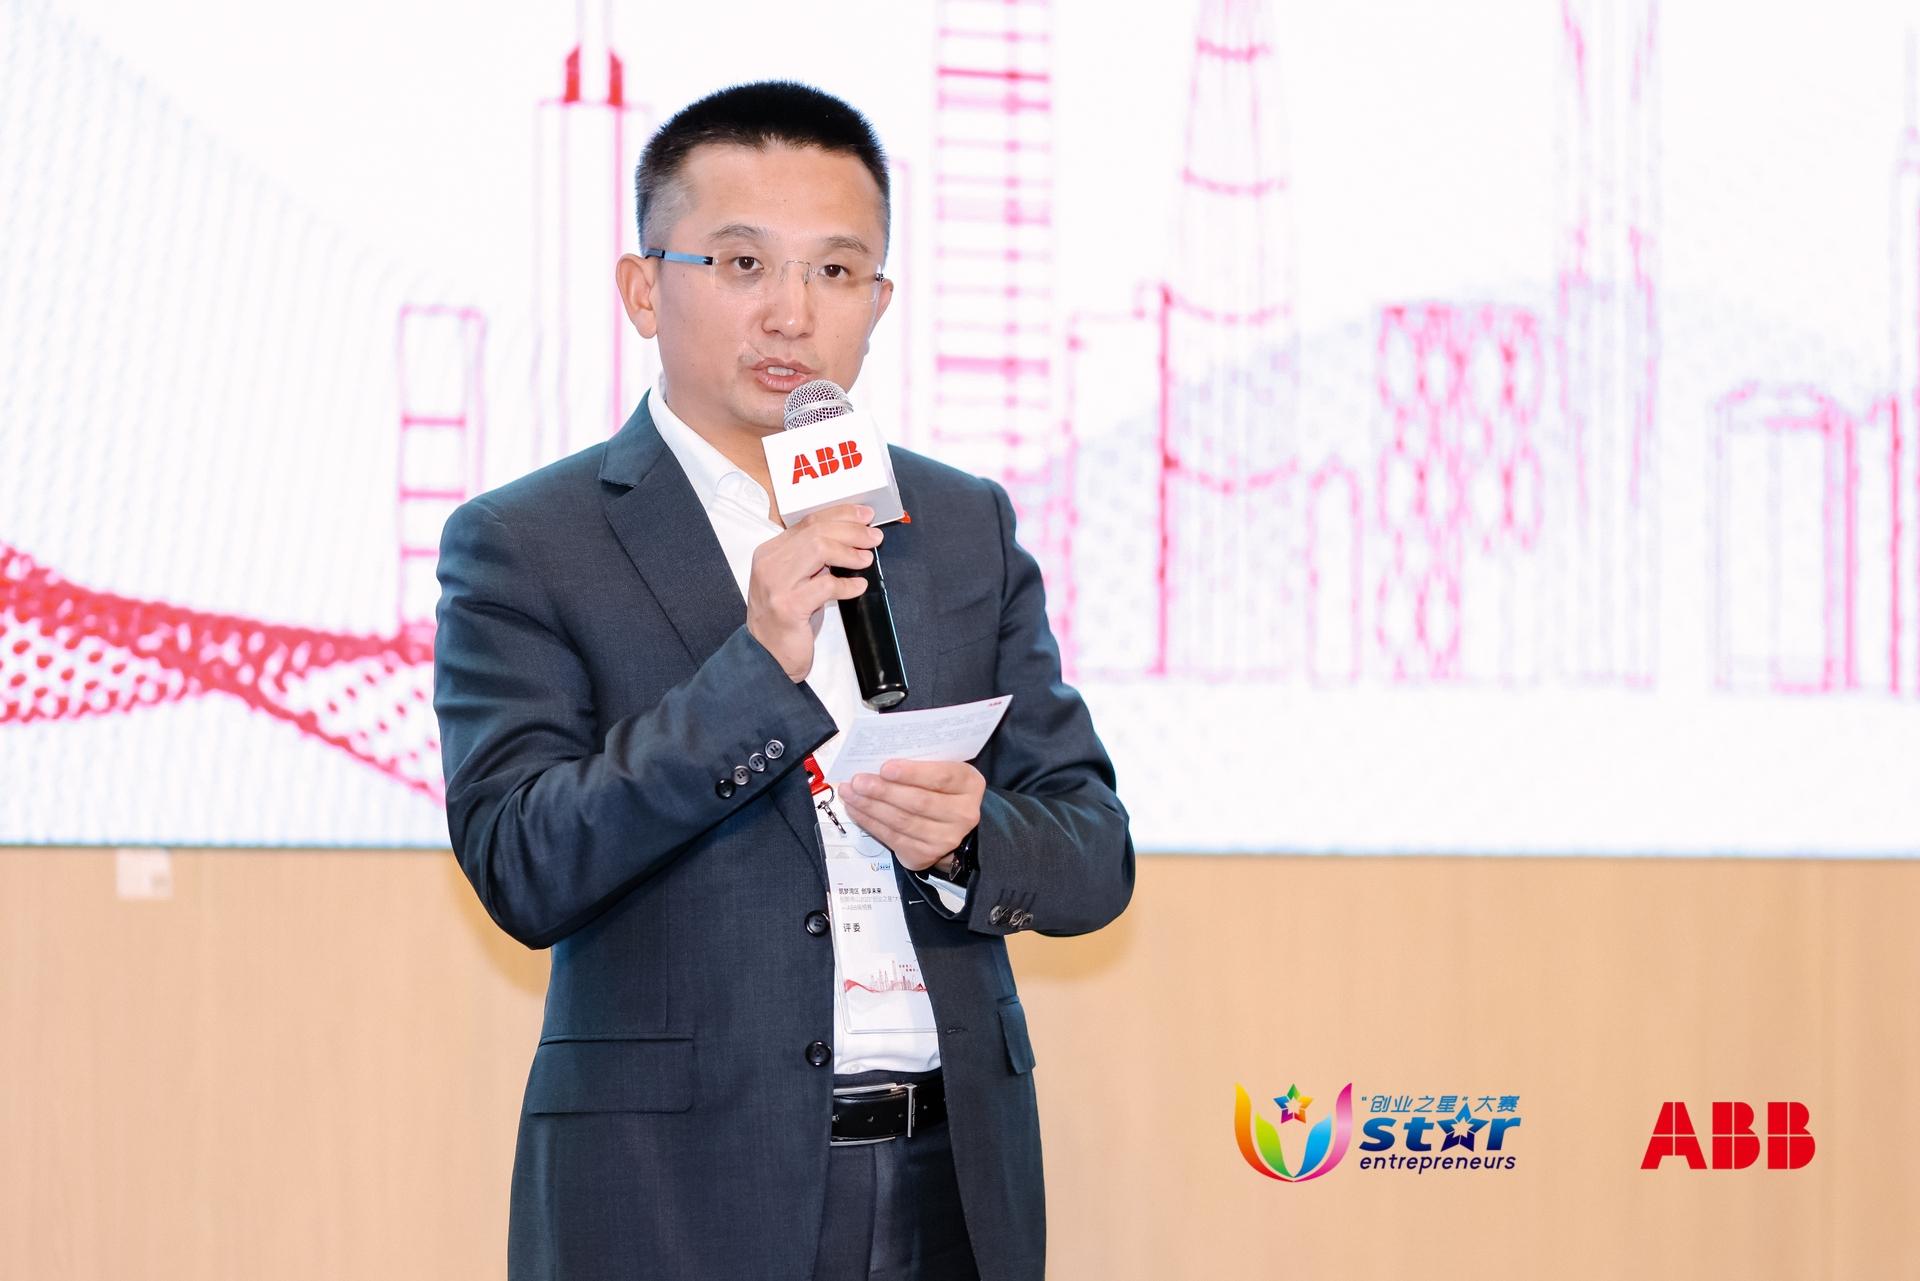 ABB电气智慧建筑亚太区负责人邹恩昌致开幕词